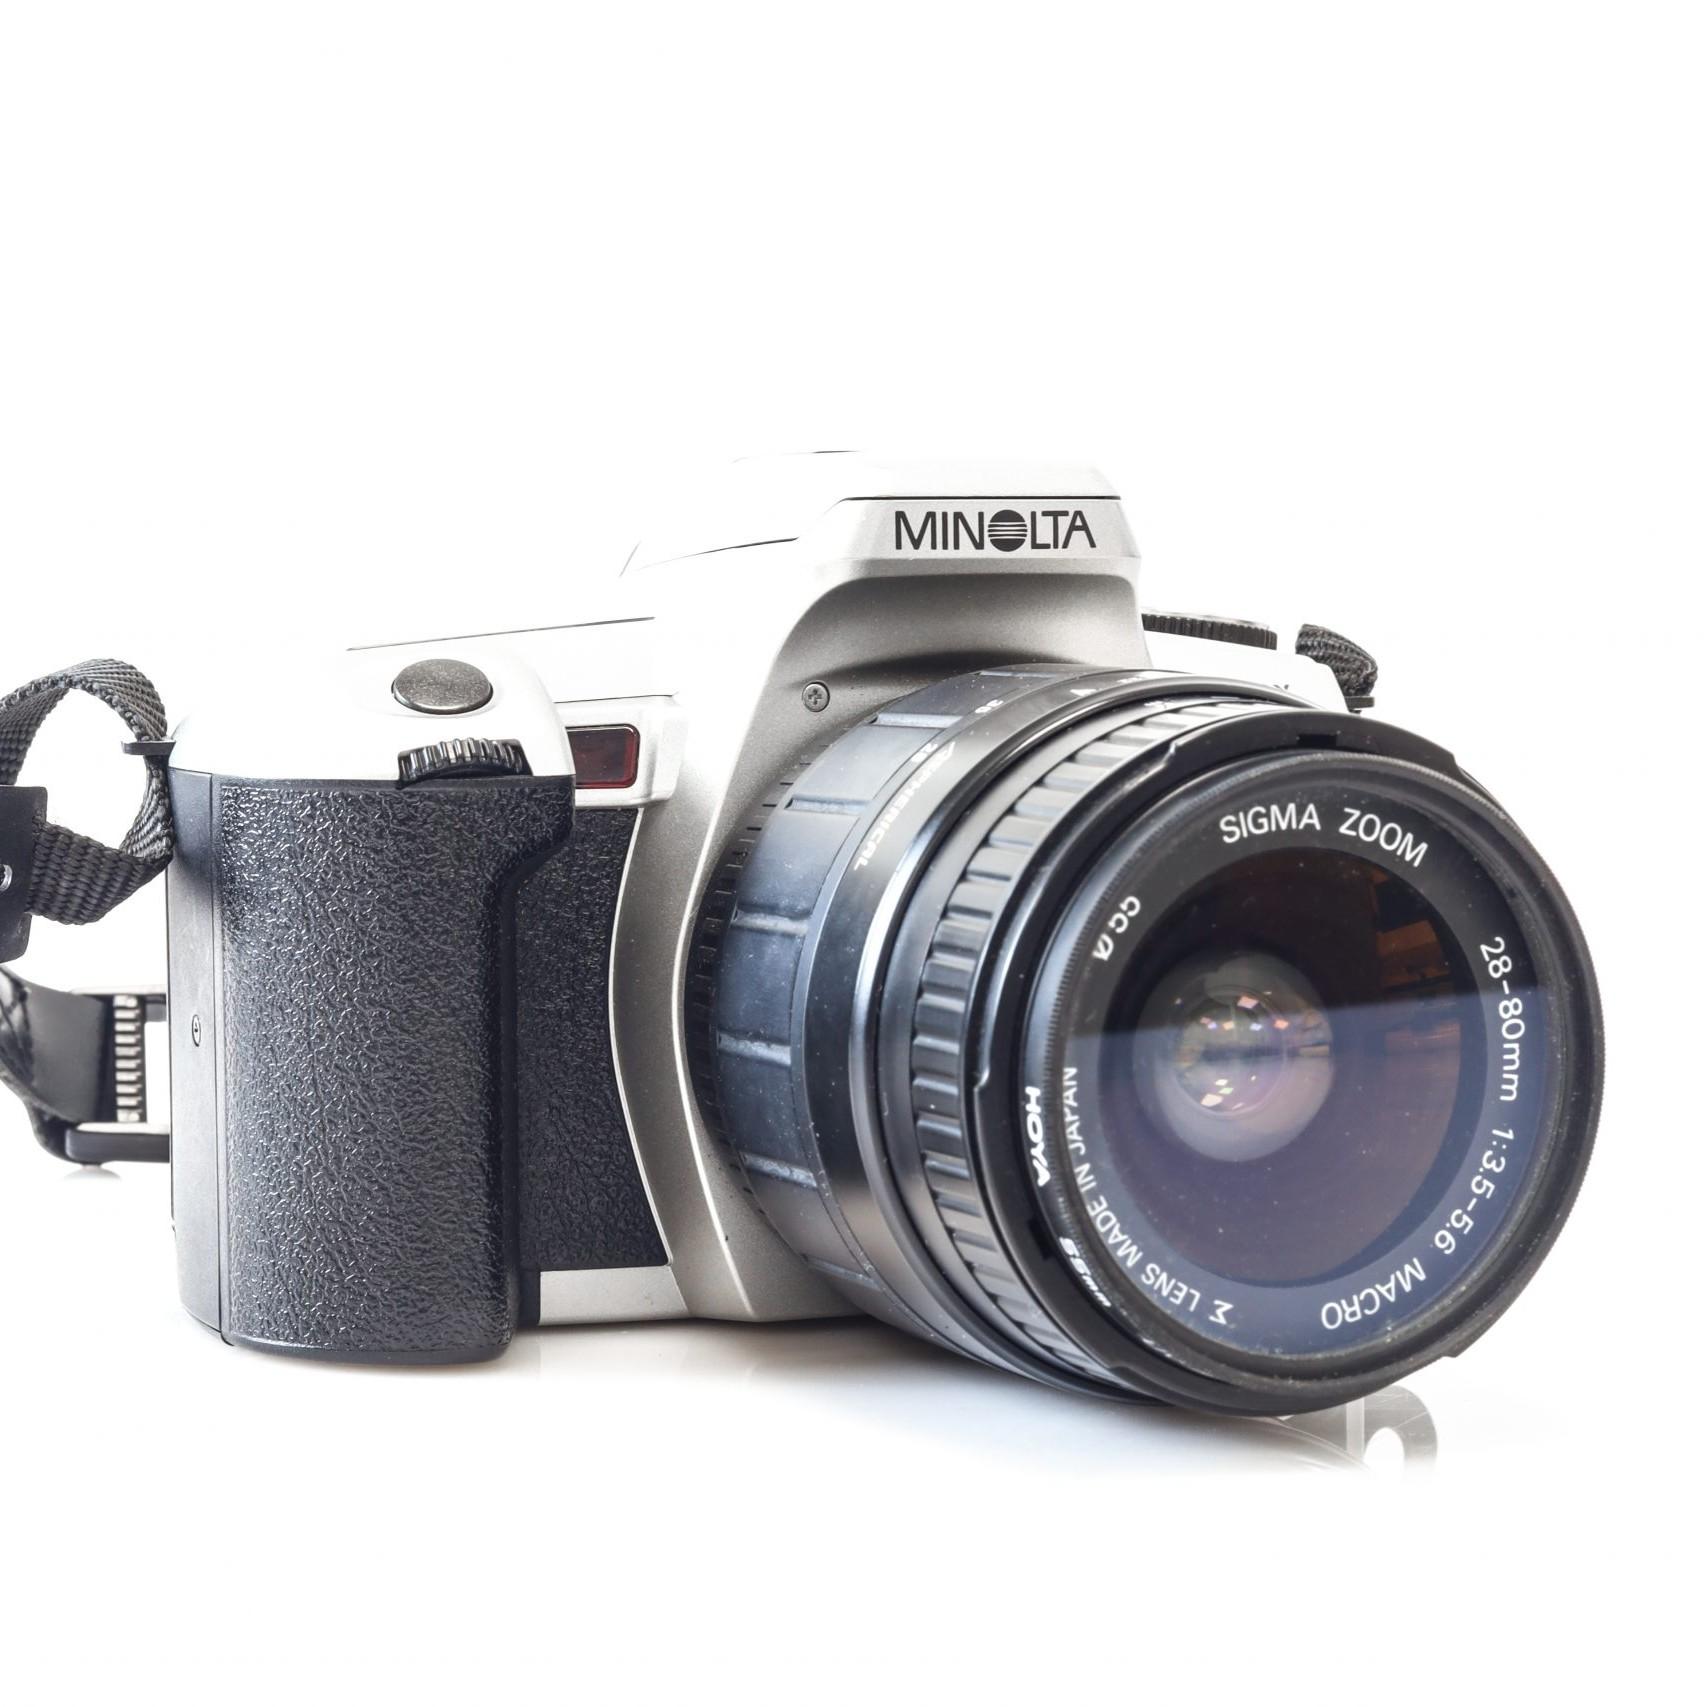 Fantastic Minolta Dynax 505si 35mm Film Camera + Sigma 28-80mm AF Lens